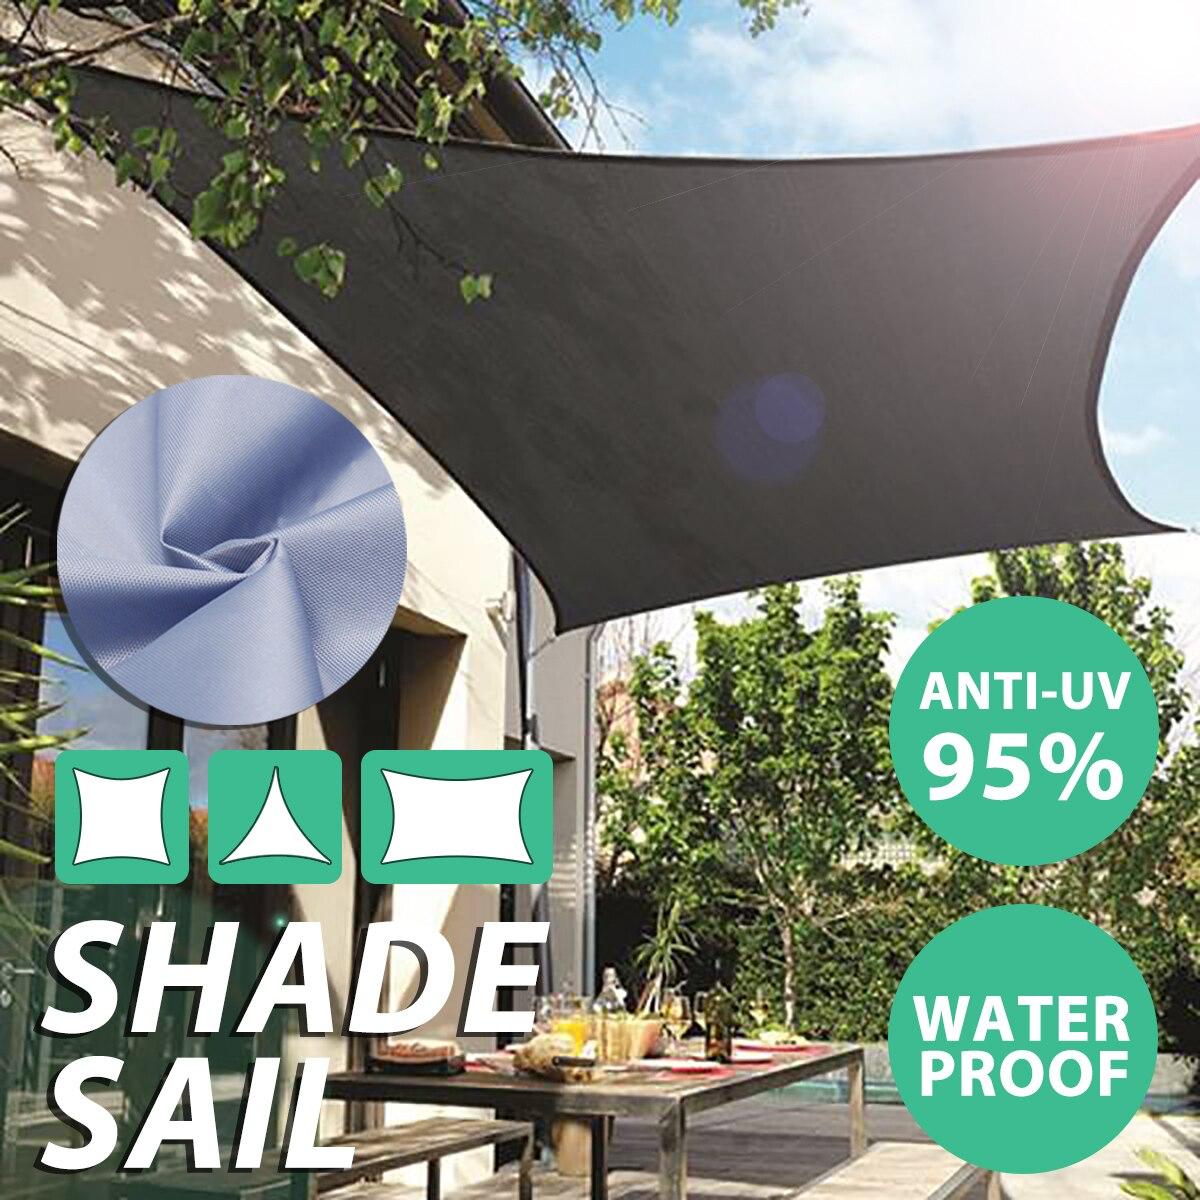 3 Shape Sun Shade Sail Canopy Patio Garden Awning Shelter Waterproof + Free Rope